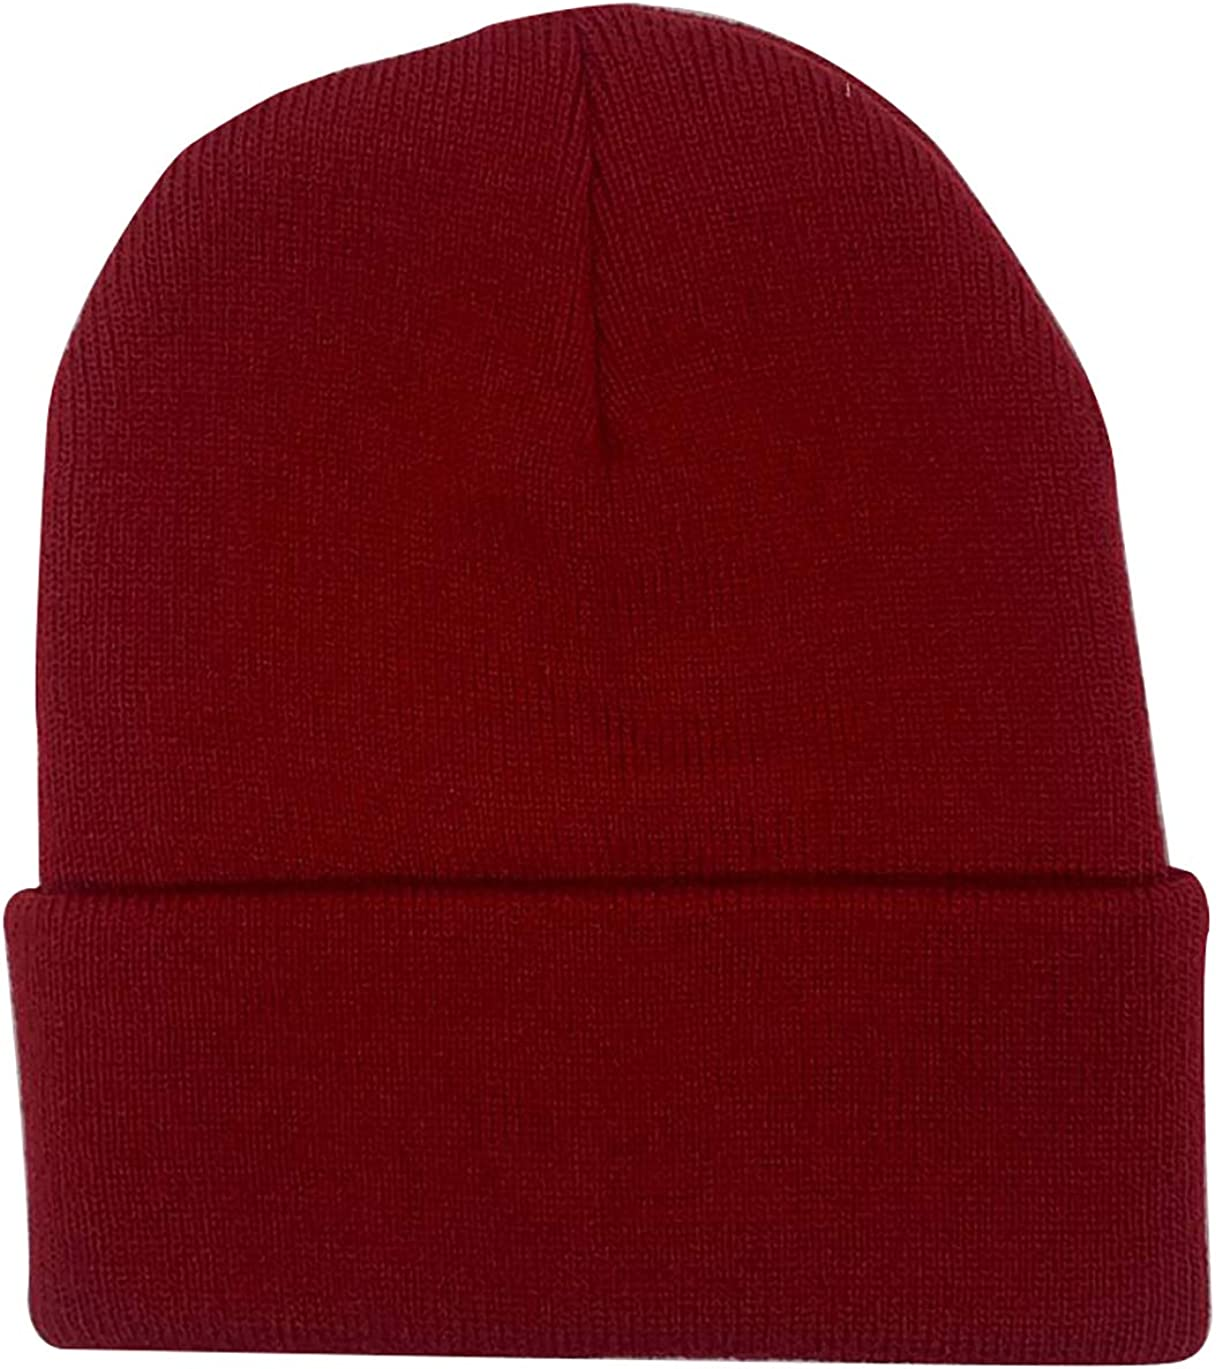 Trawler Beanie Hats Unisex Cuff Knit Cap Winter Warm Hat Fisherman Plain Skull Knit Hat Cap